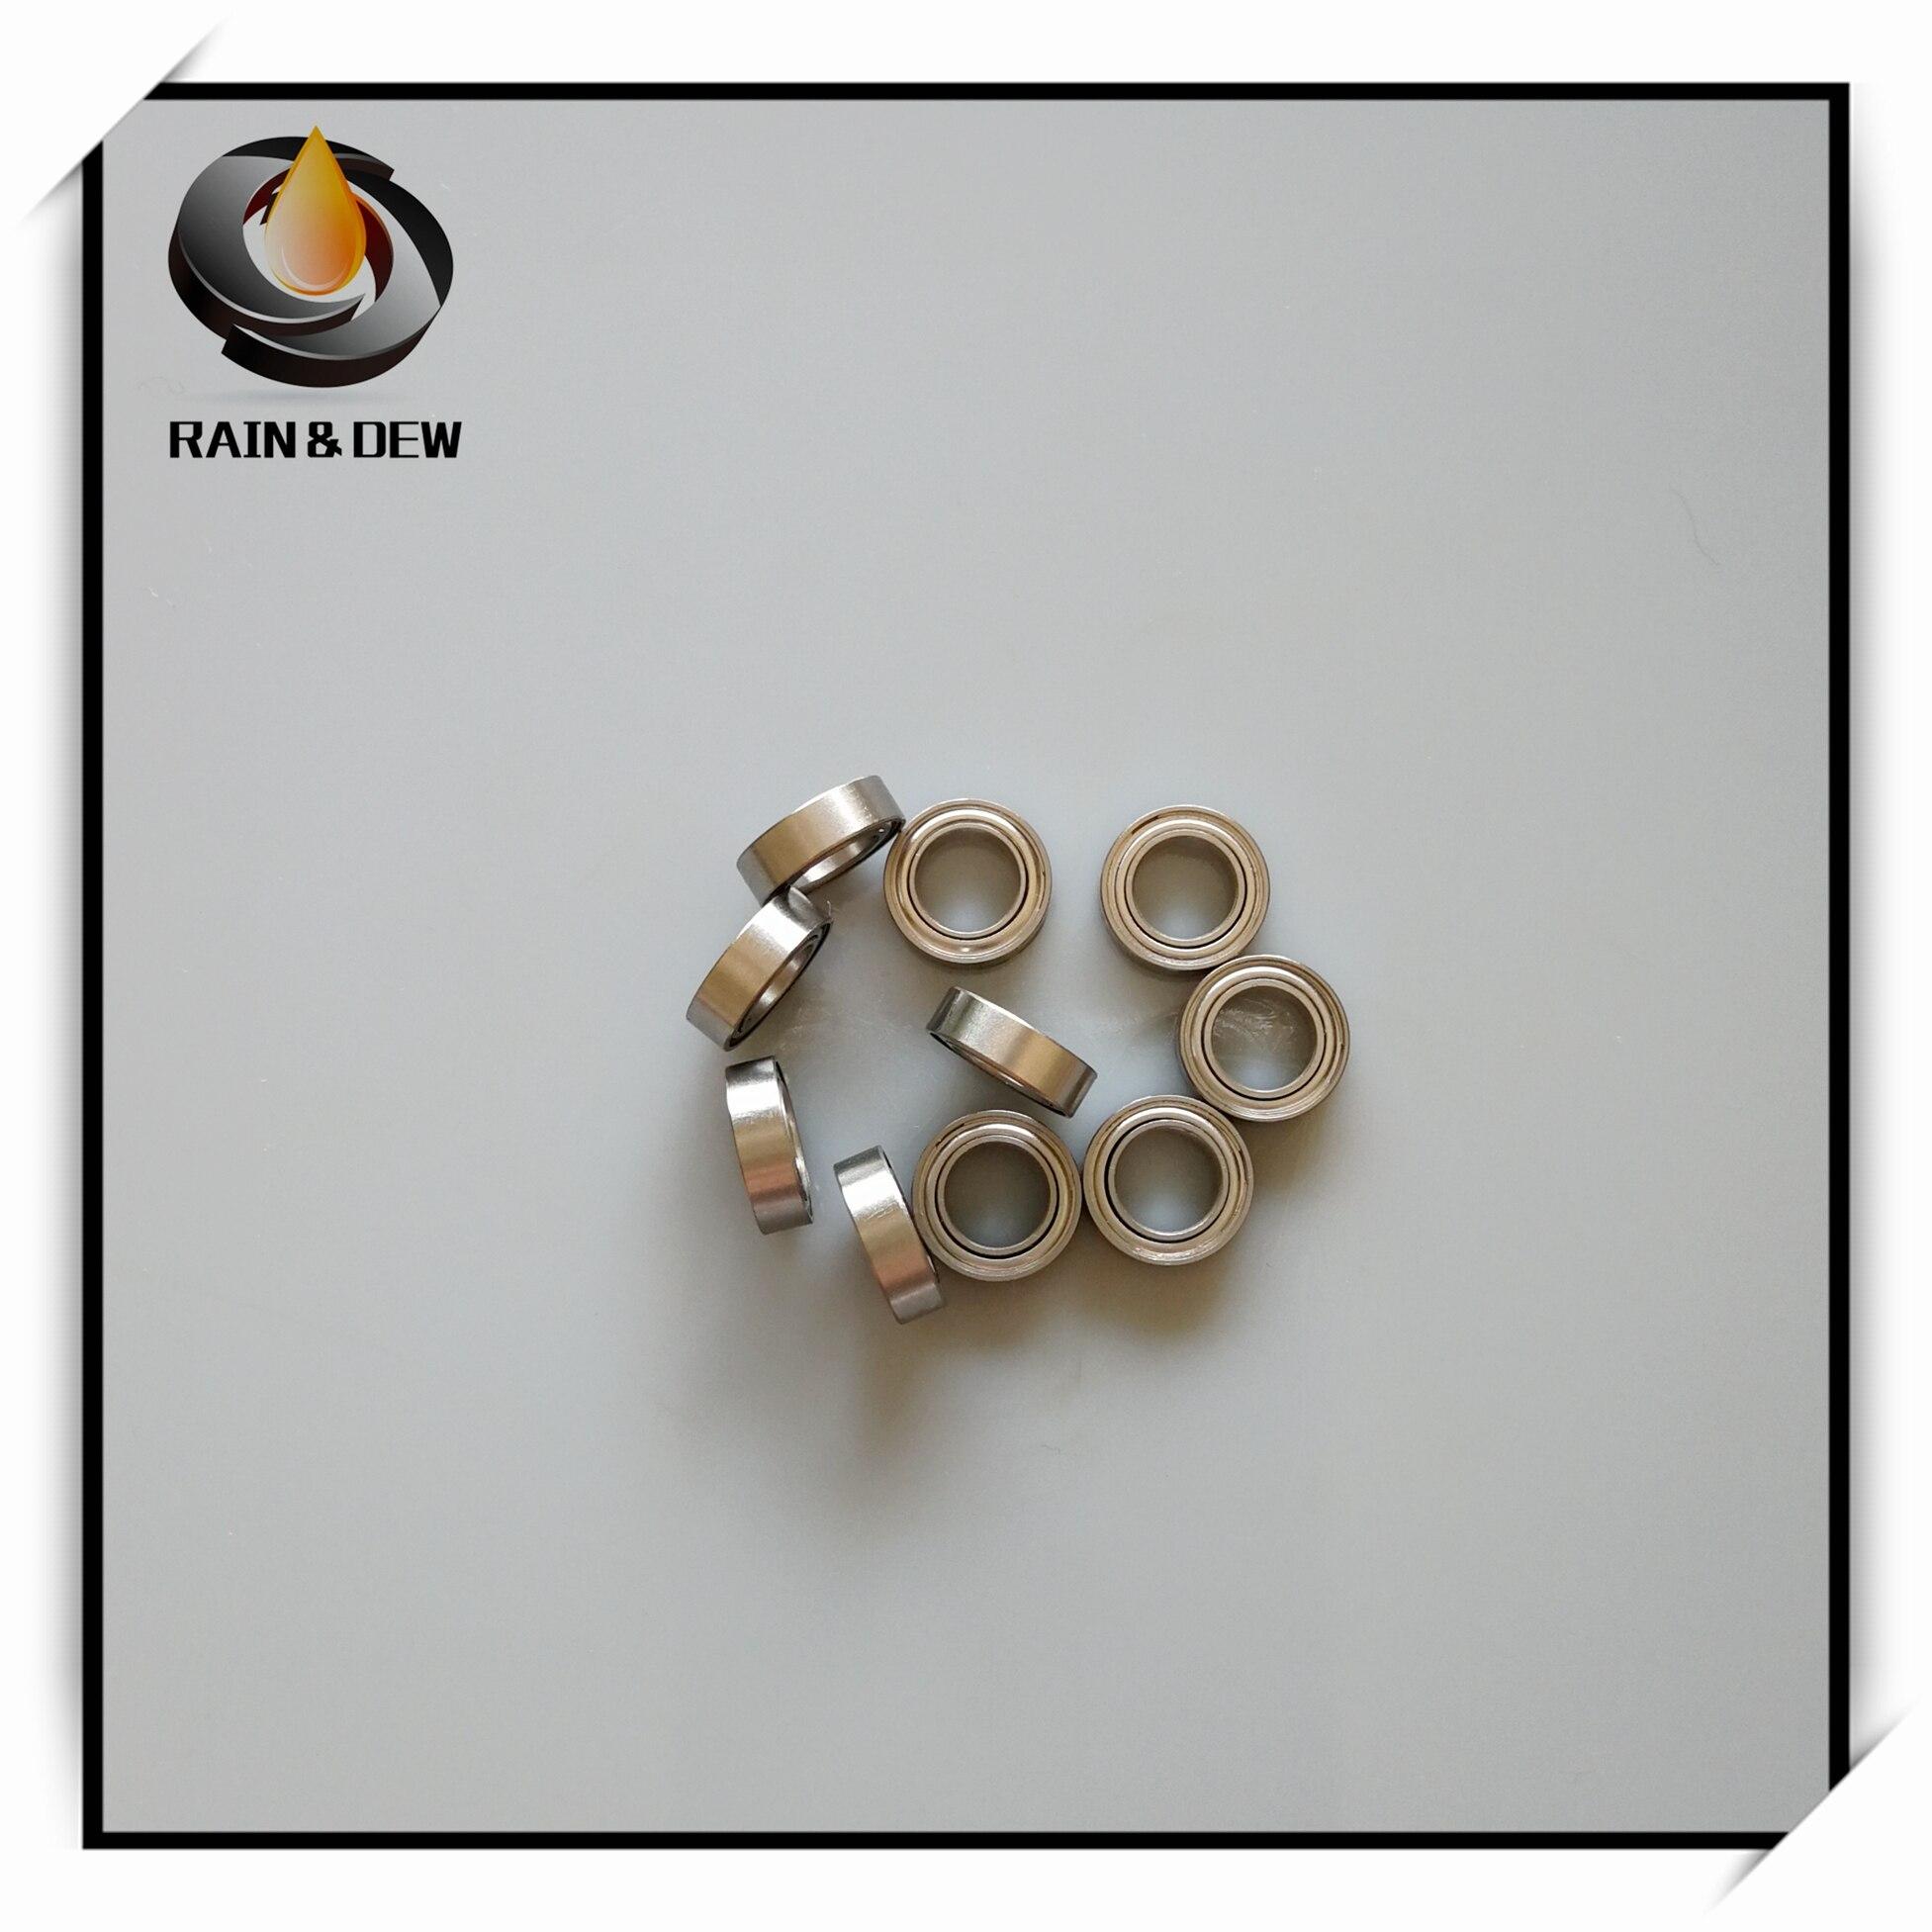 5x9x3 mm ABEC-7 1 PCS SMR95-2RS 440c Stainless Steel CERAMIC Ball Bearing